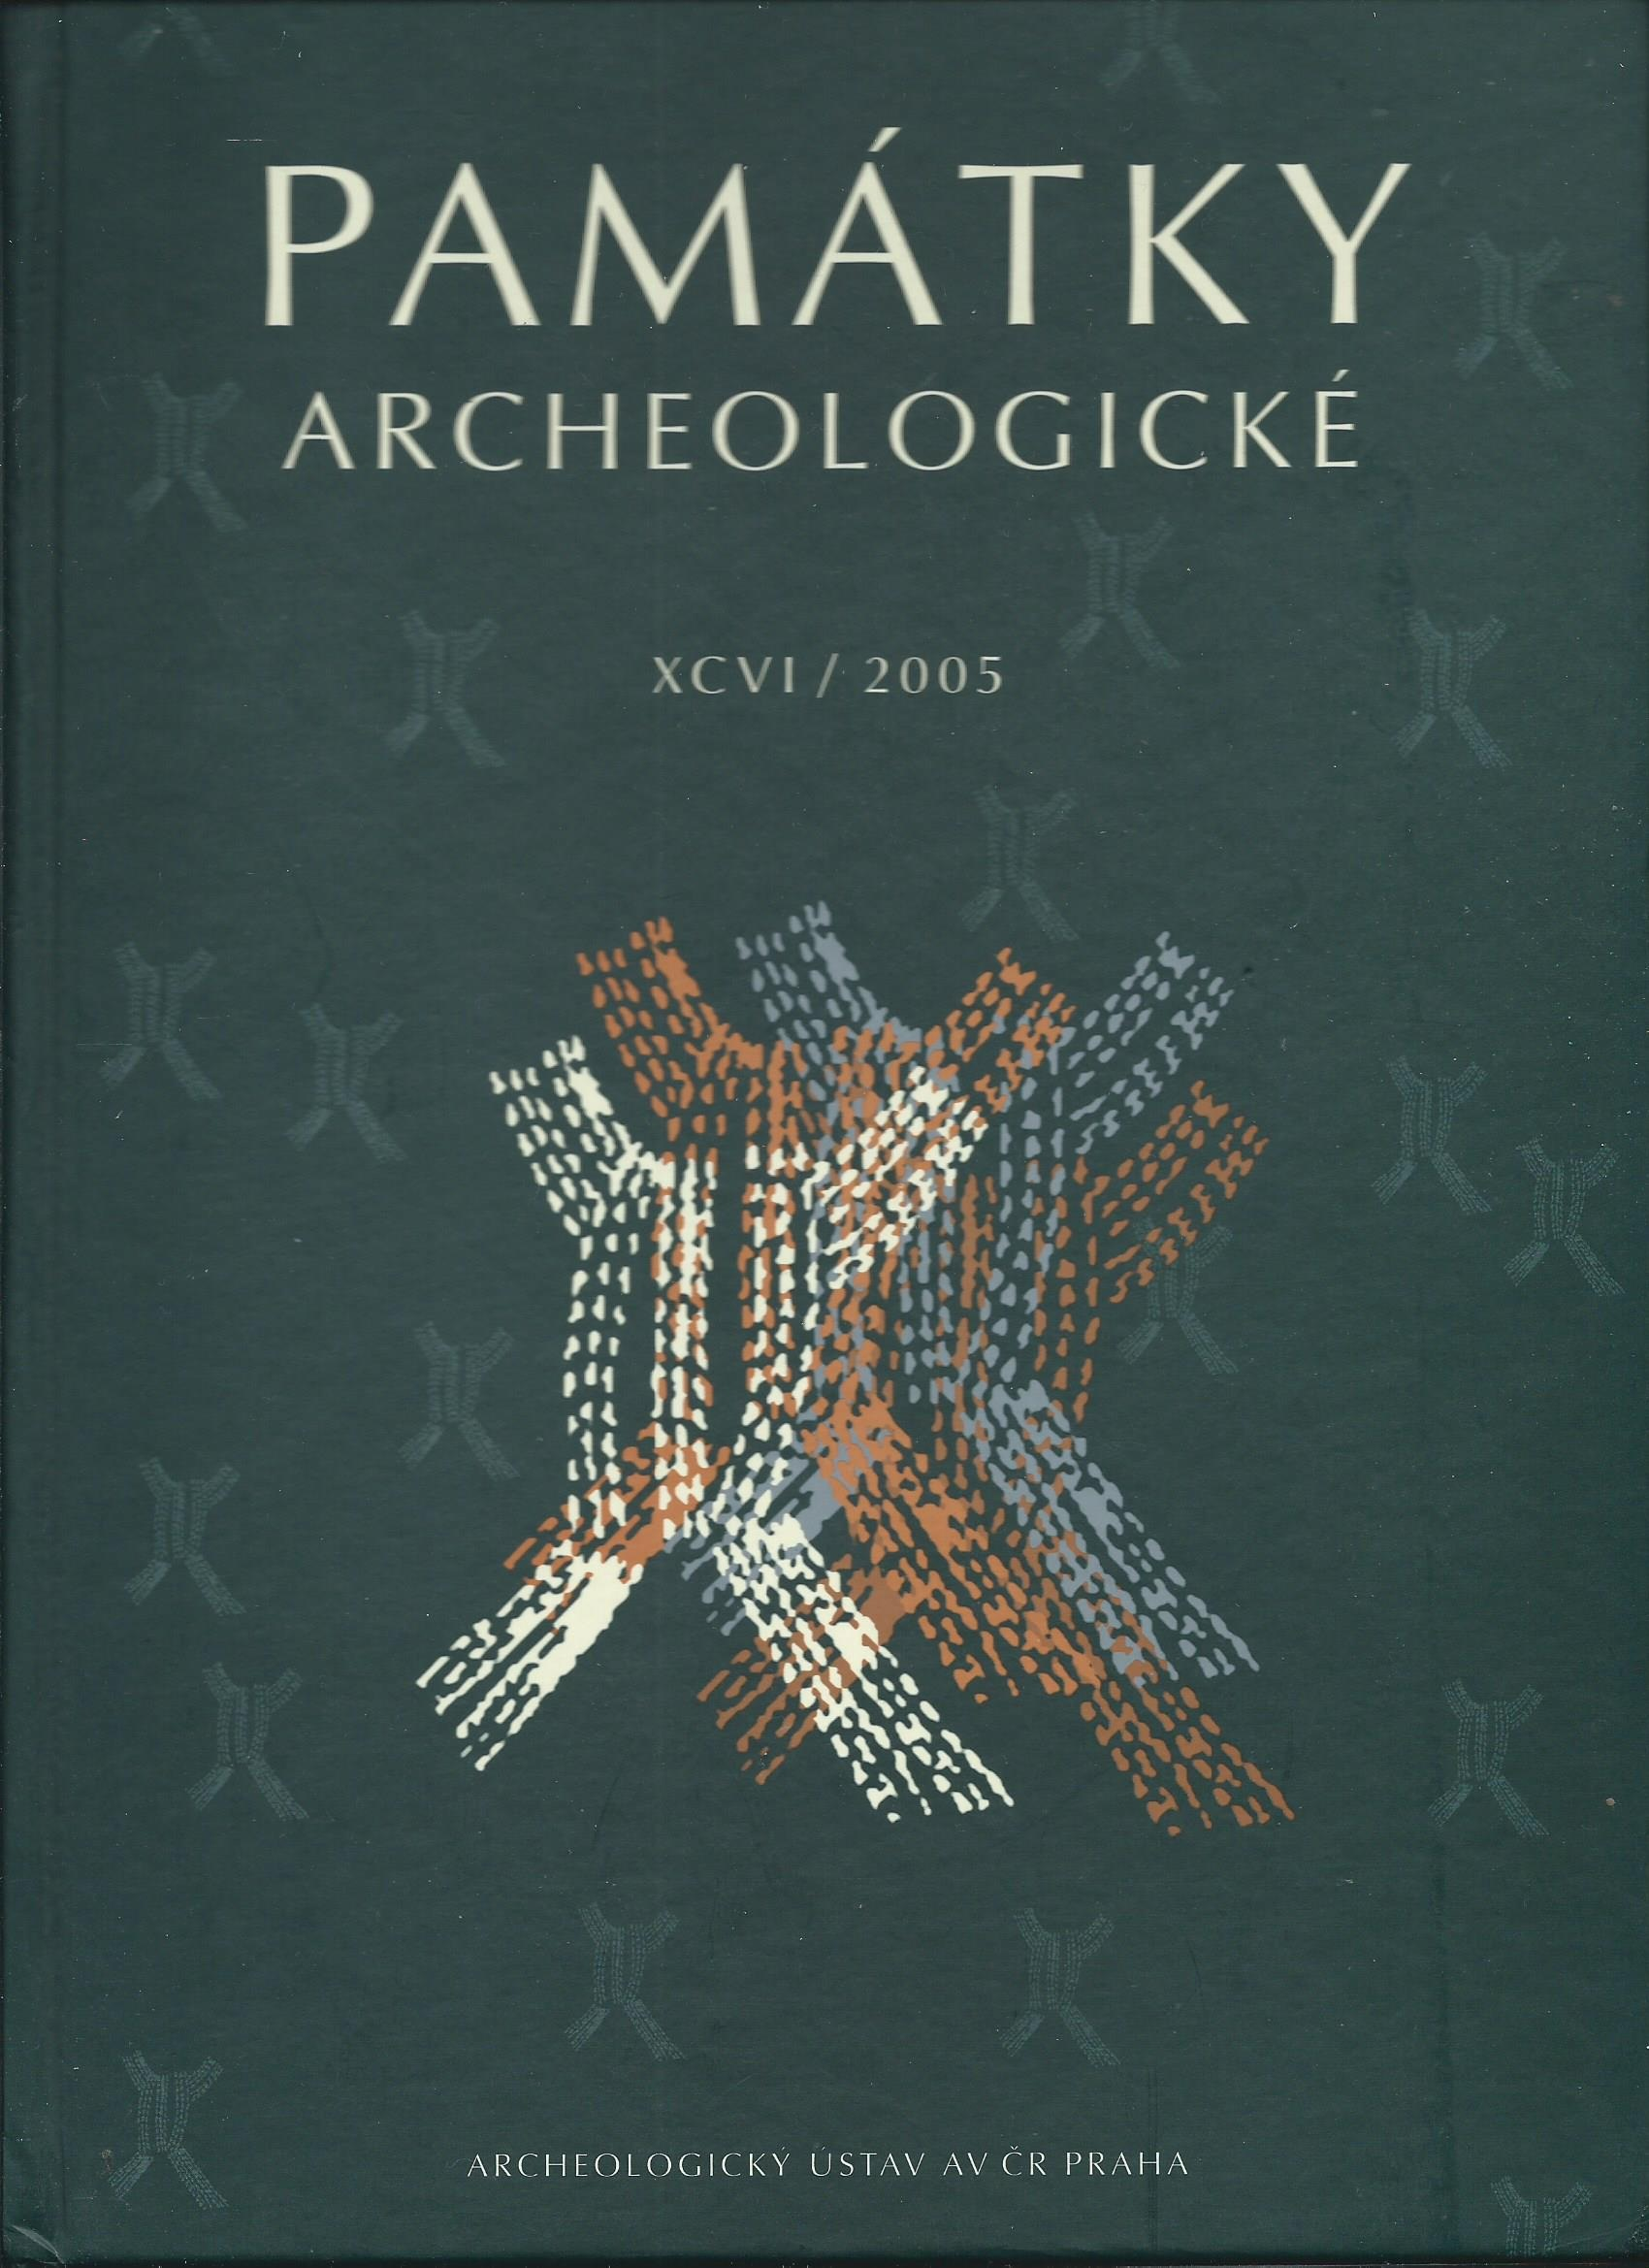 Památky archeologické - Archeologický ústav Akademie věd České republiky